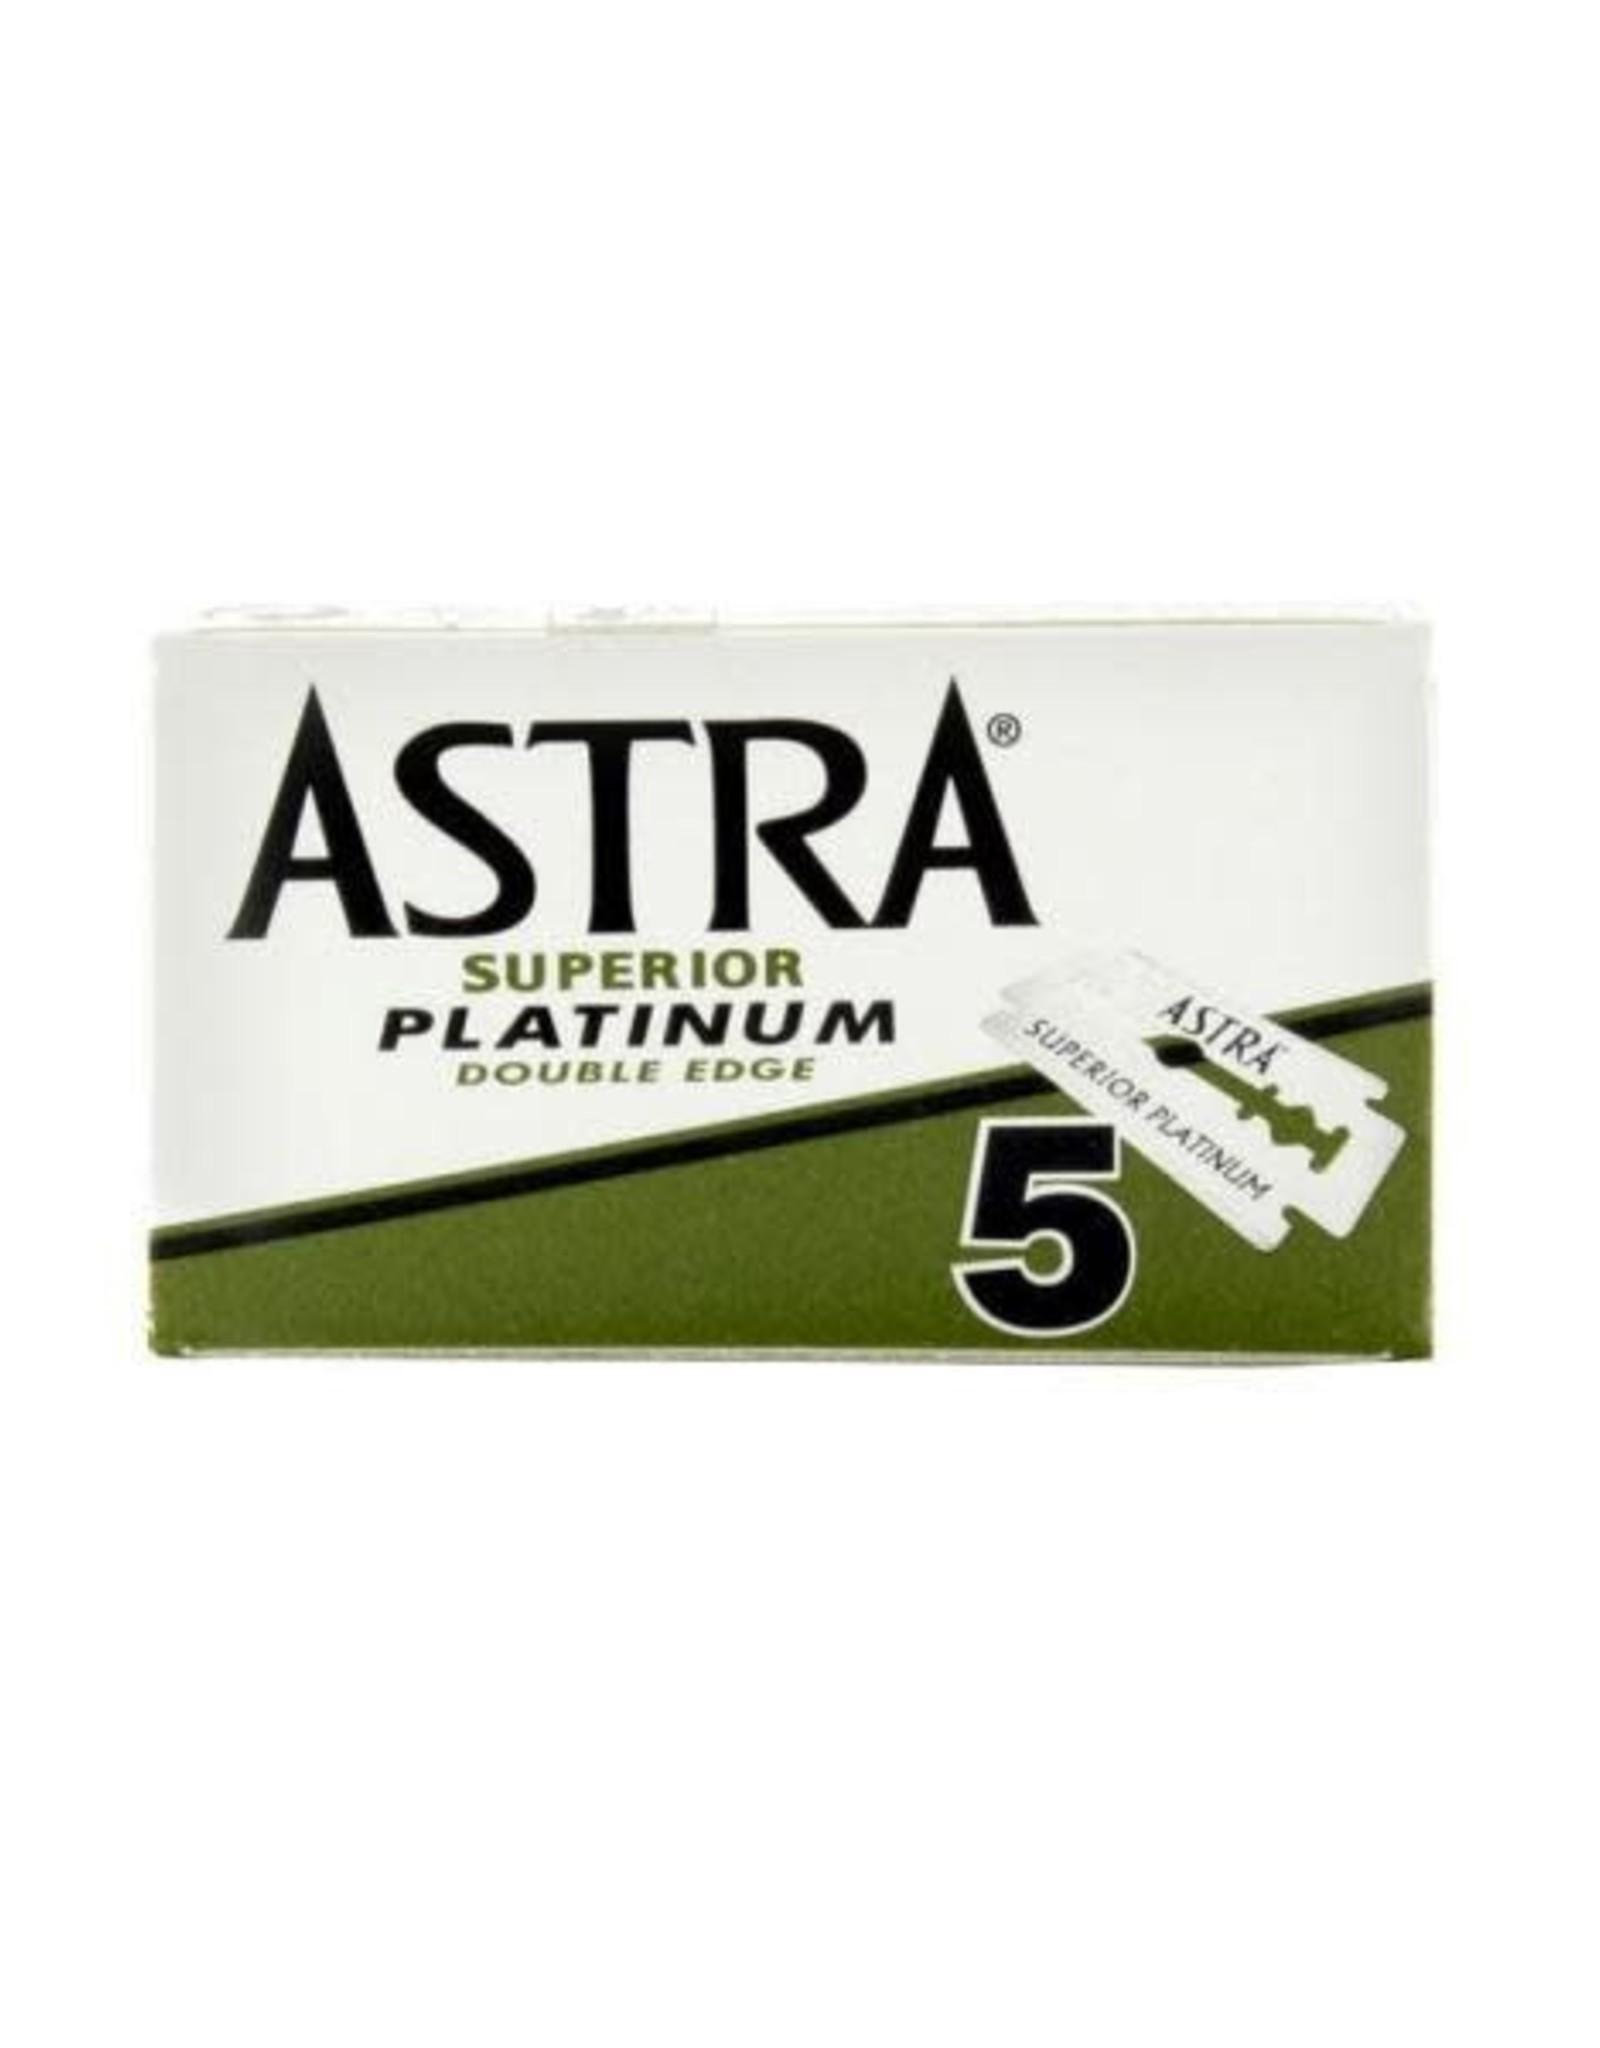 Astra Bambaw/Astra Platinum blades double edge 5 mesjes